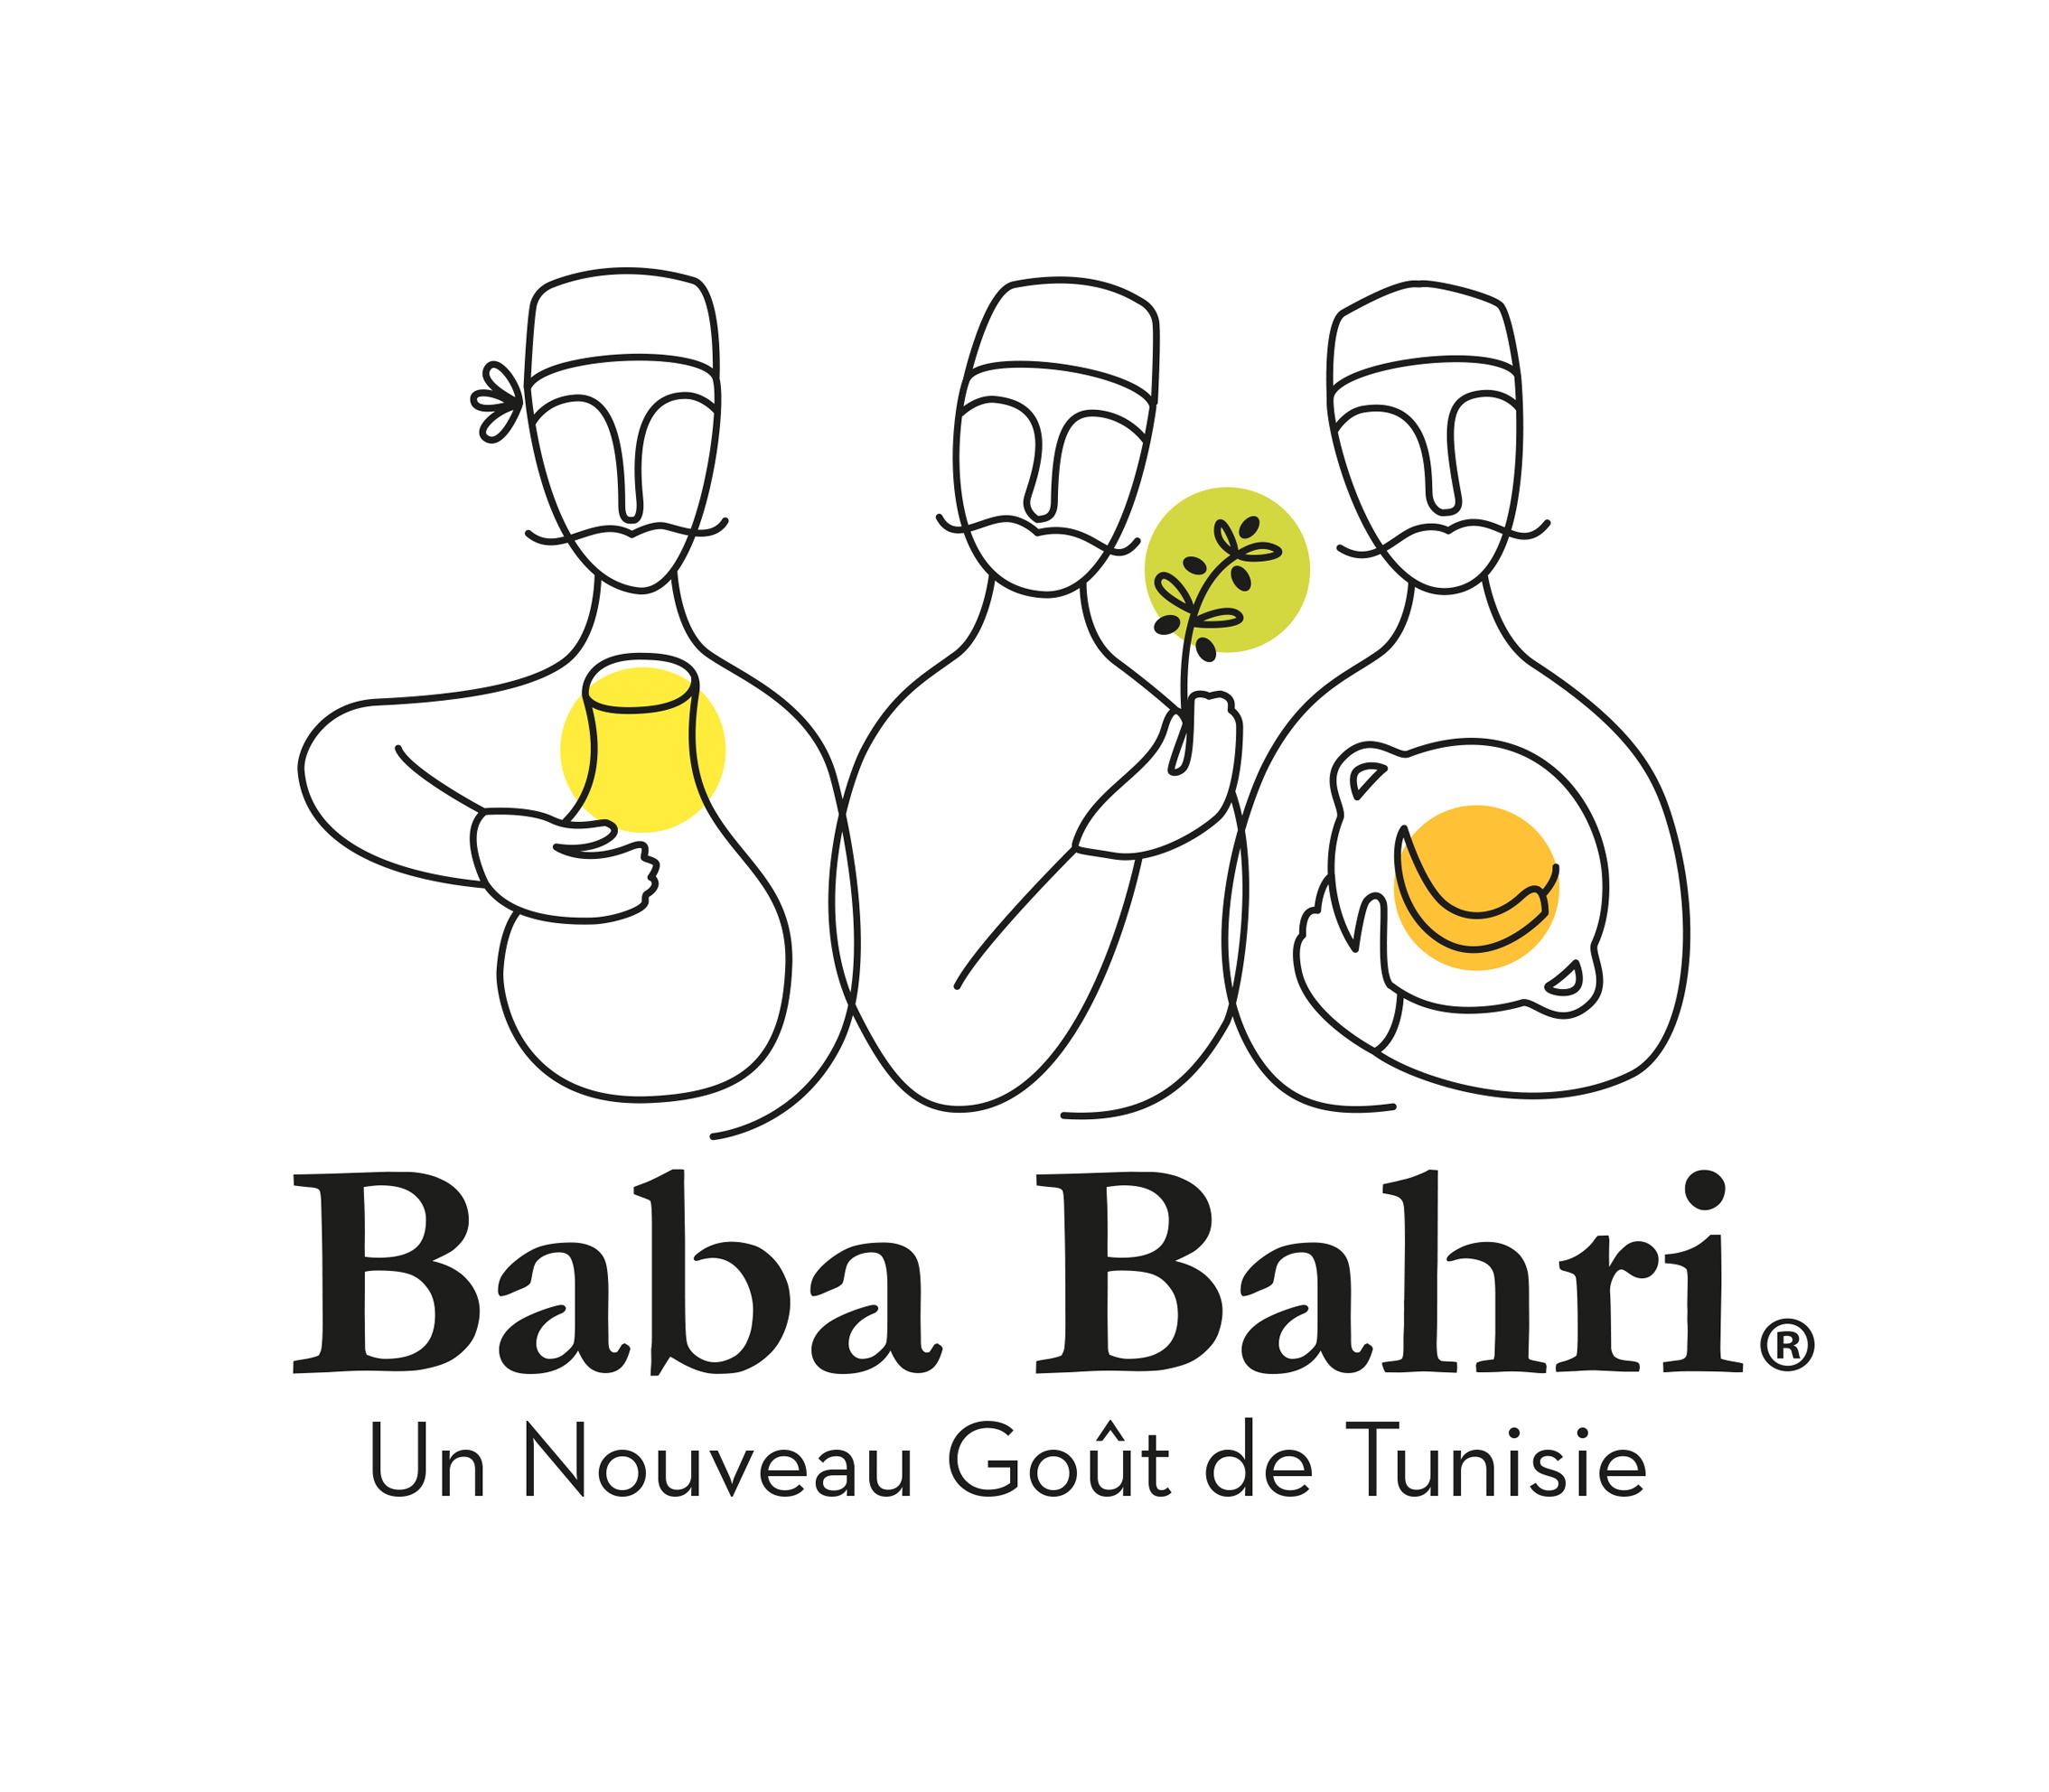 Baba Bahri - Un Nouveau Goût de Tunisie